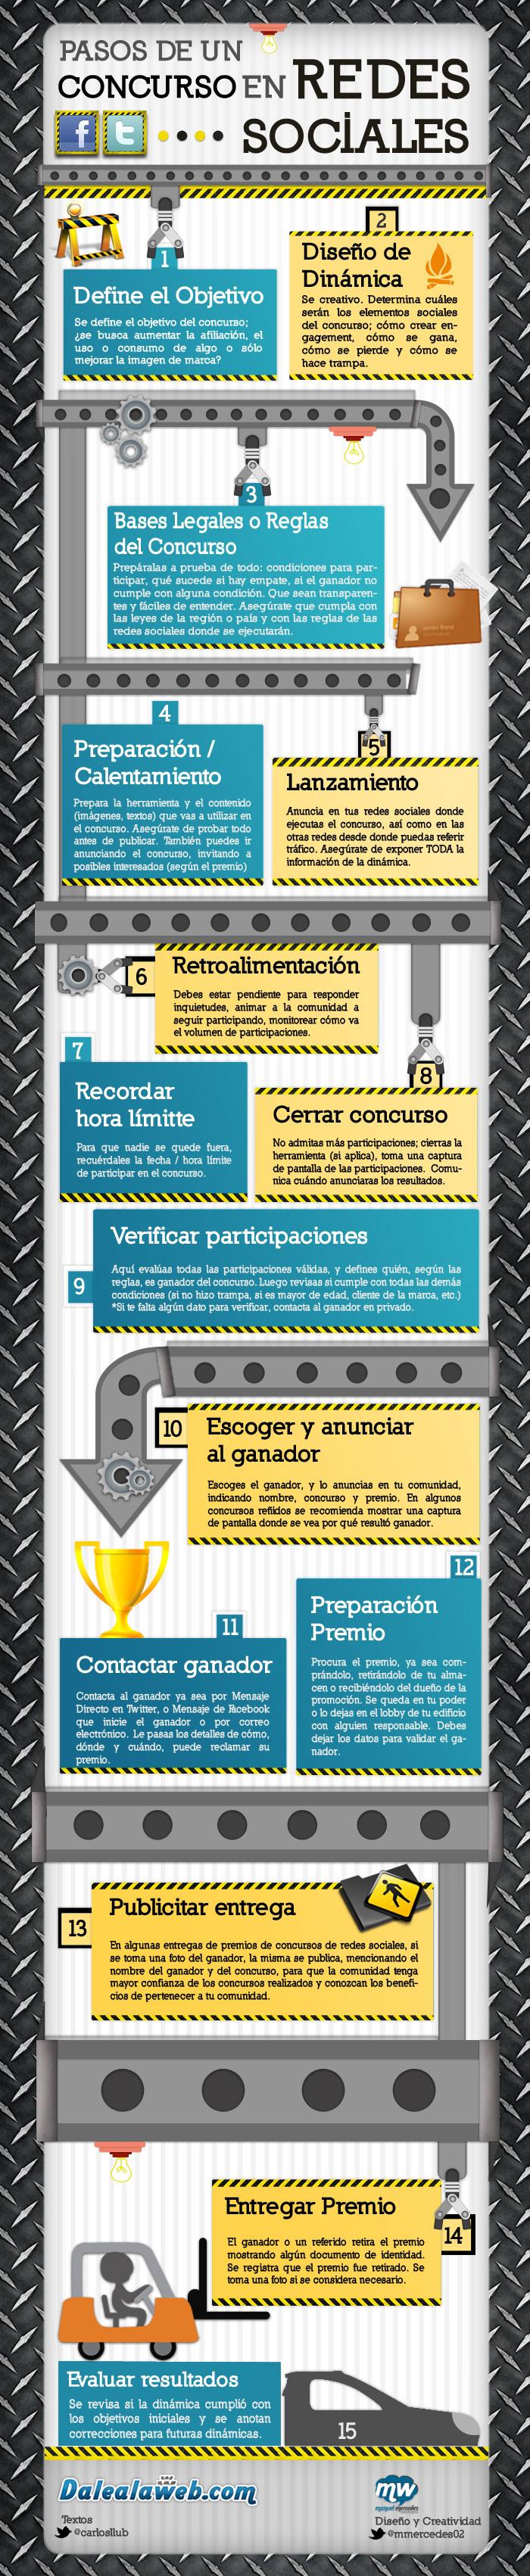 Infografia-Pasos-Concursos-Redes-Sociales-Dalealaweb